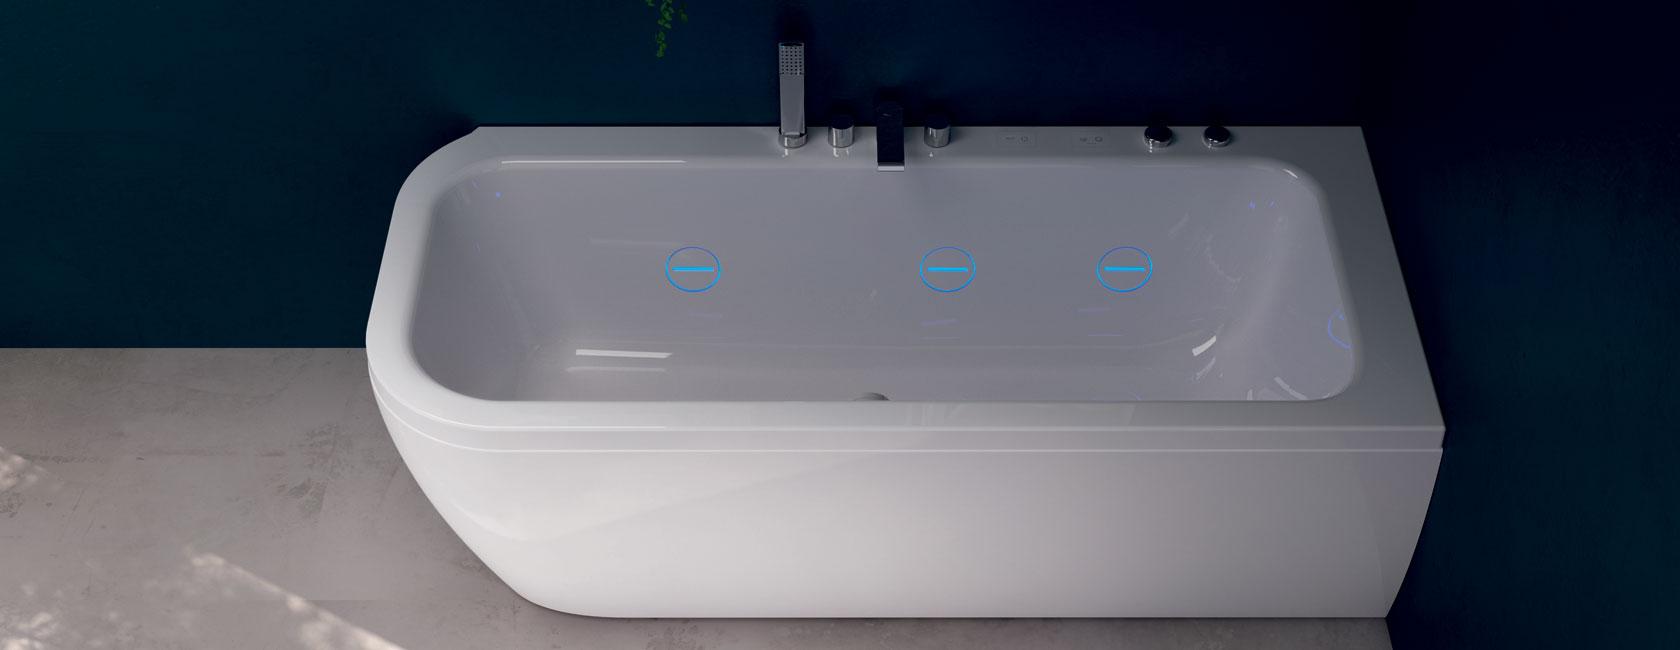 Amazing vasche da bagno piccole with vasche da bagno piccole - Ricoprire vasca da bagno prezzi ...